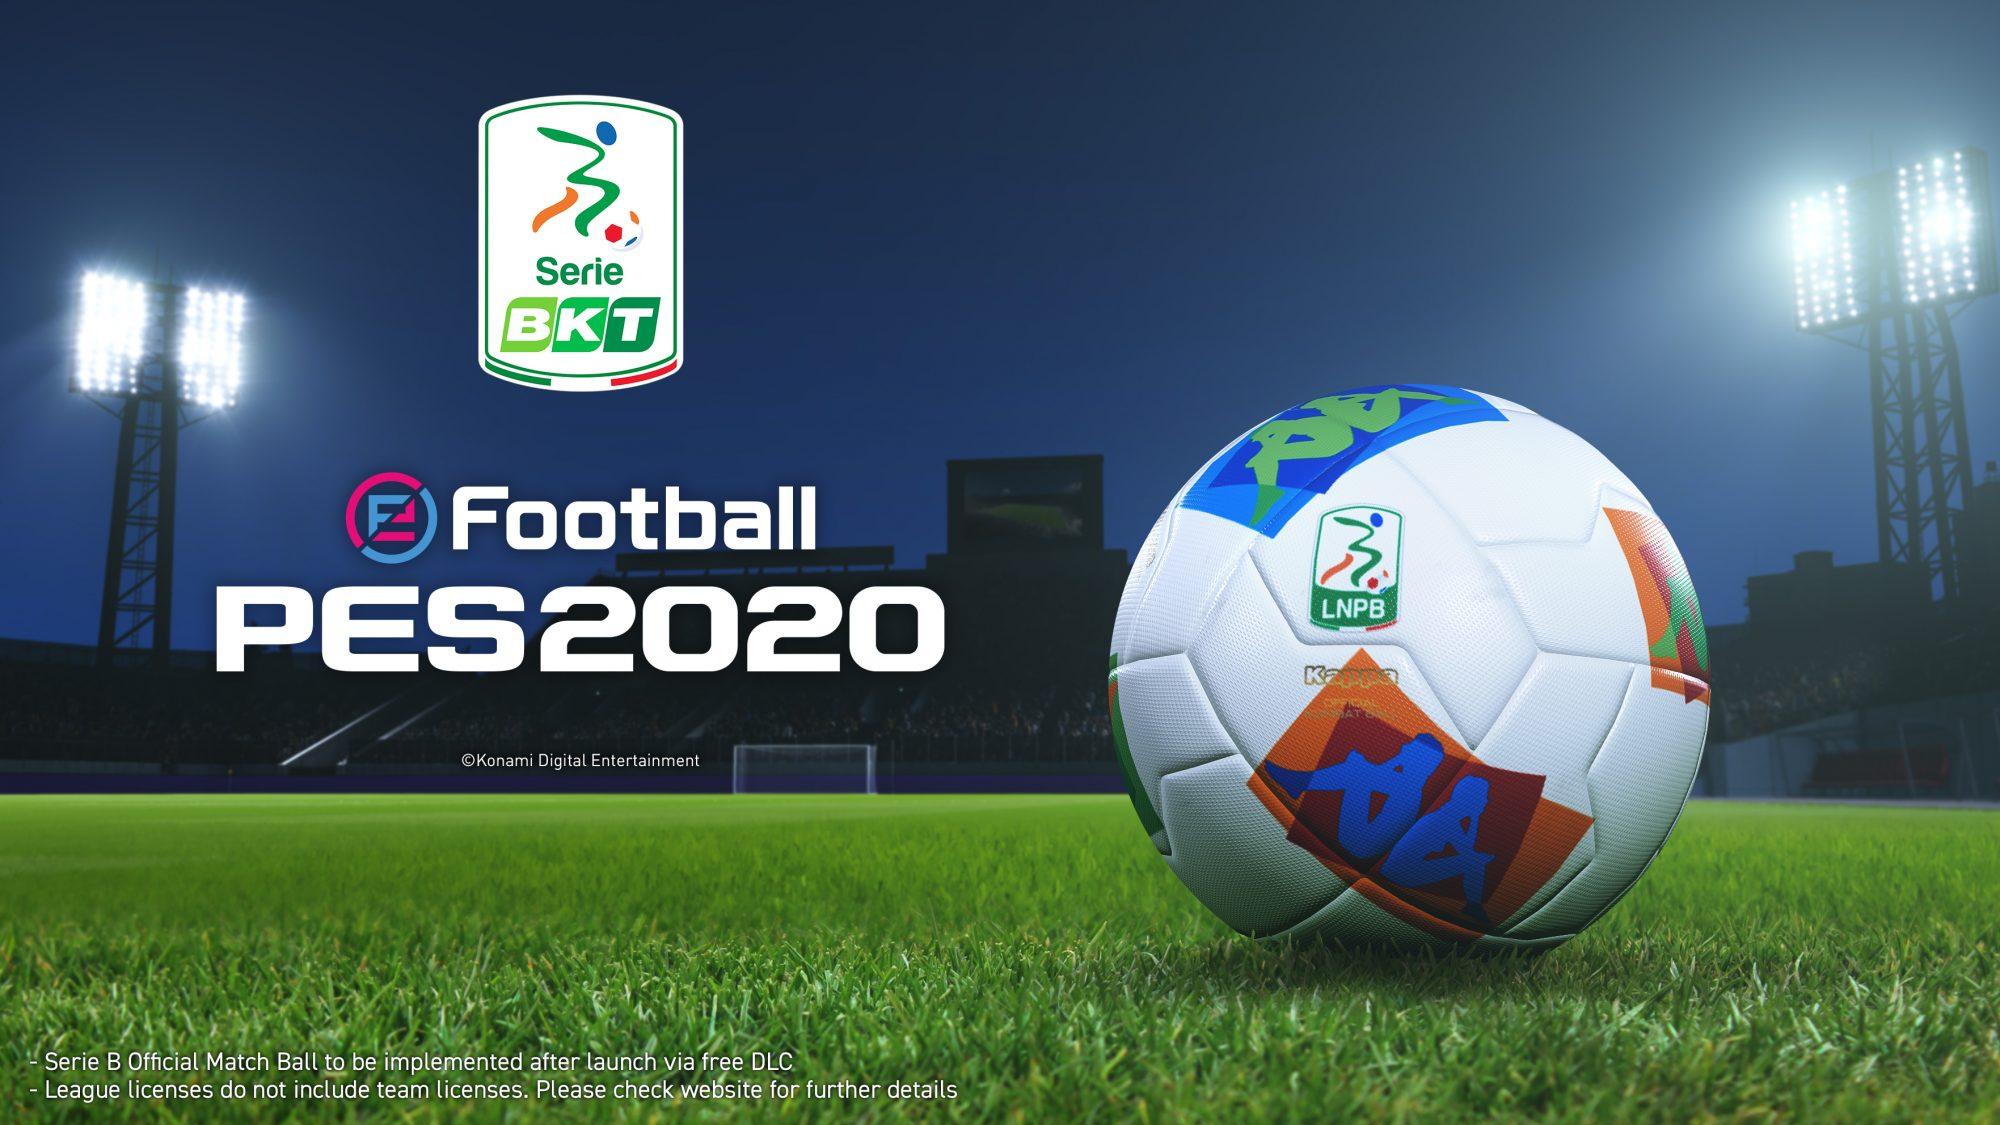 eFootball PES 2020: la serie B e altre novità nel Data Pack 2.0 gratuito thumbnail